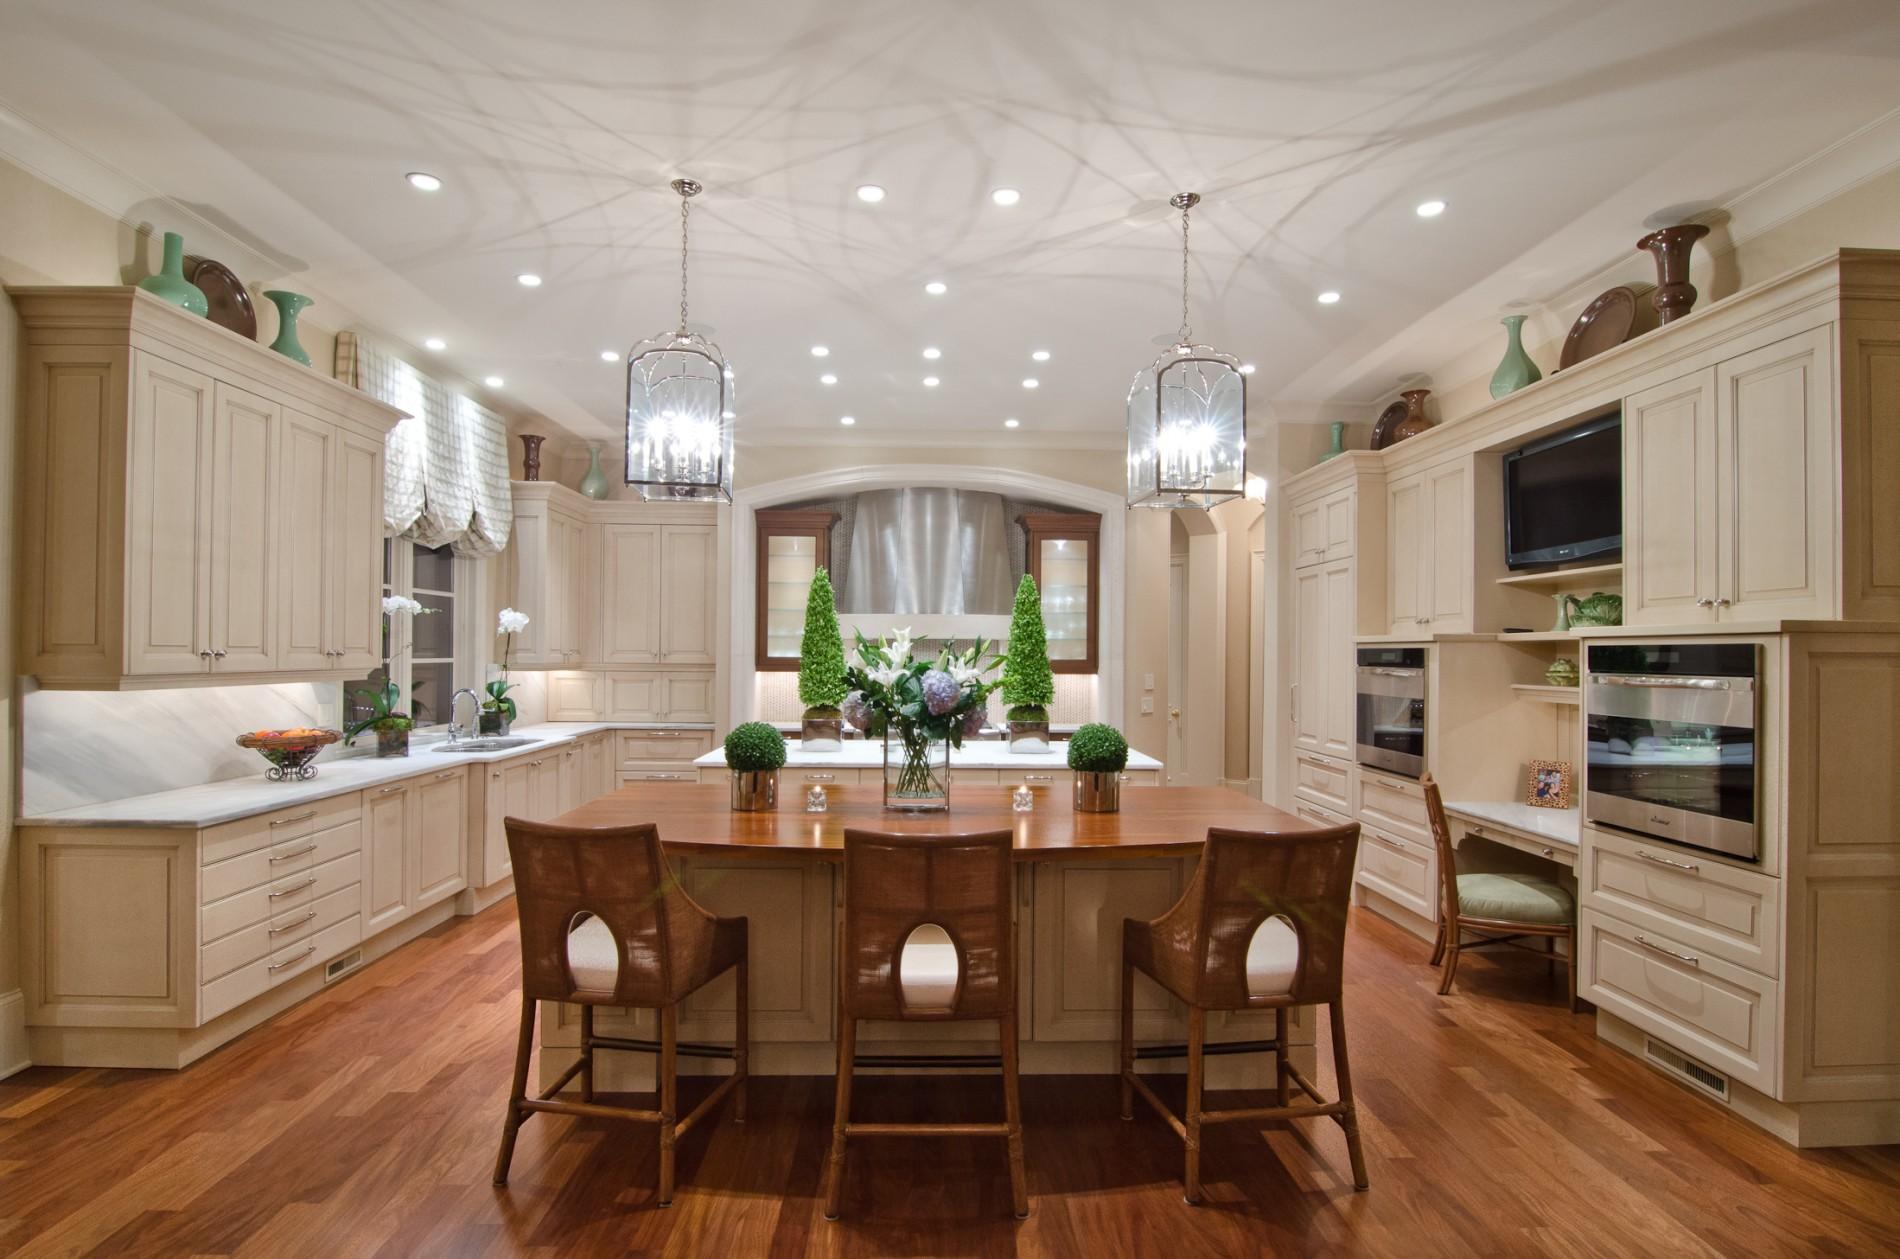 kitchen-double-islands-stainless-steel.jpg